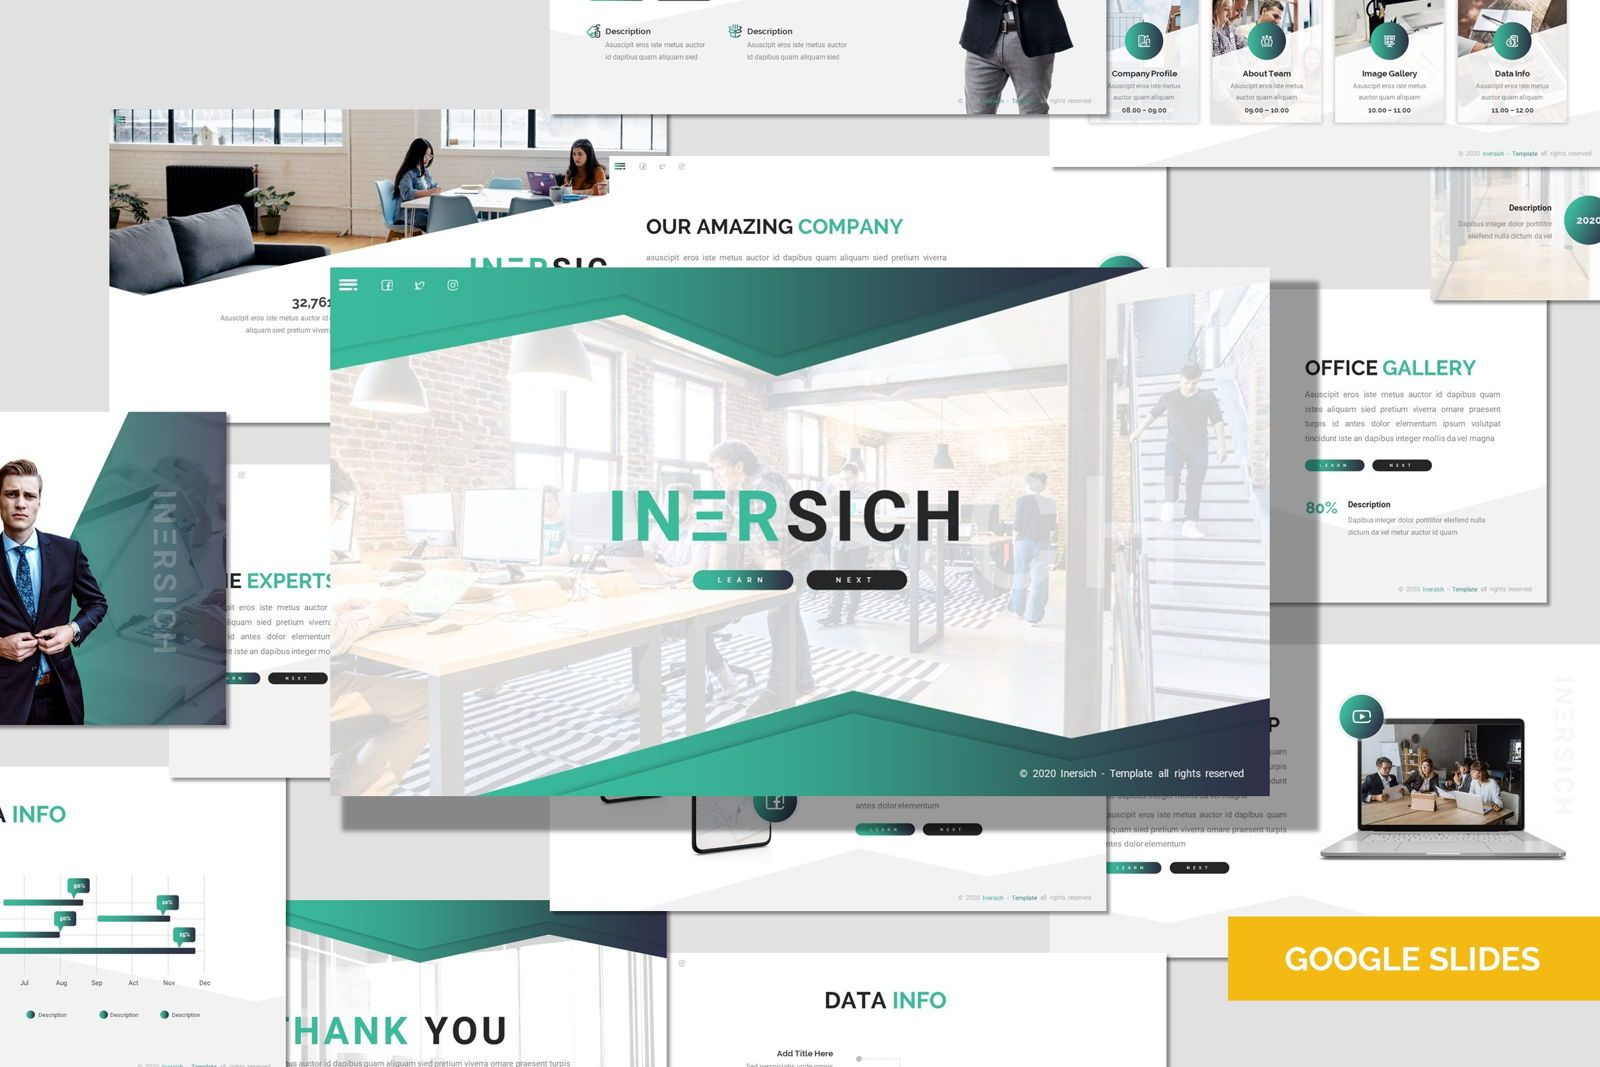 Inersich - Google Slides Template, 08043, Presentation Templates — PoweredTemplate.com